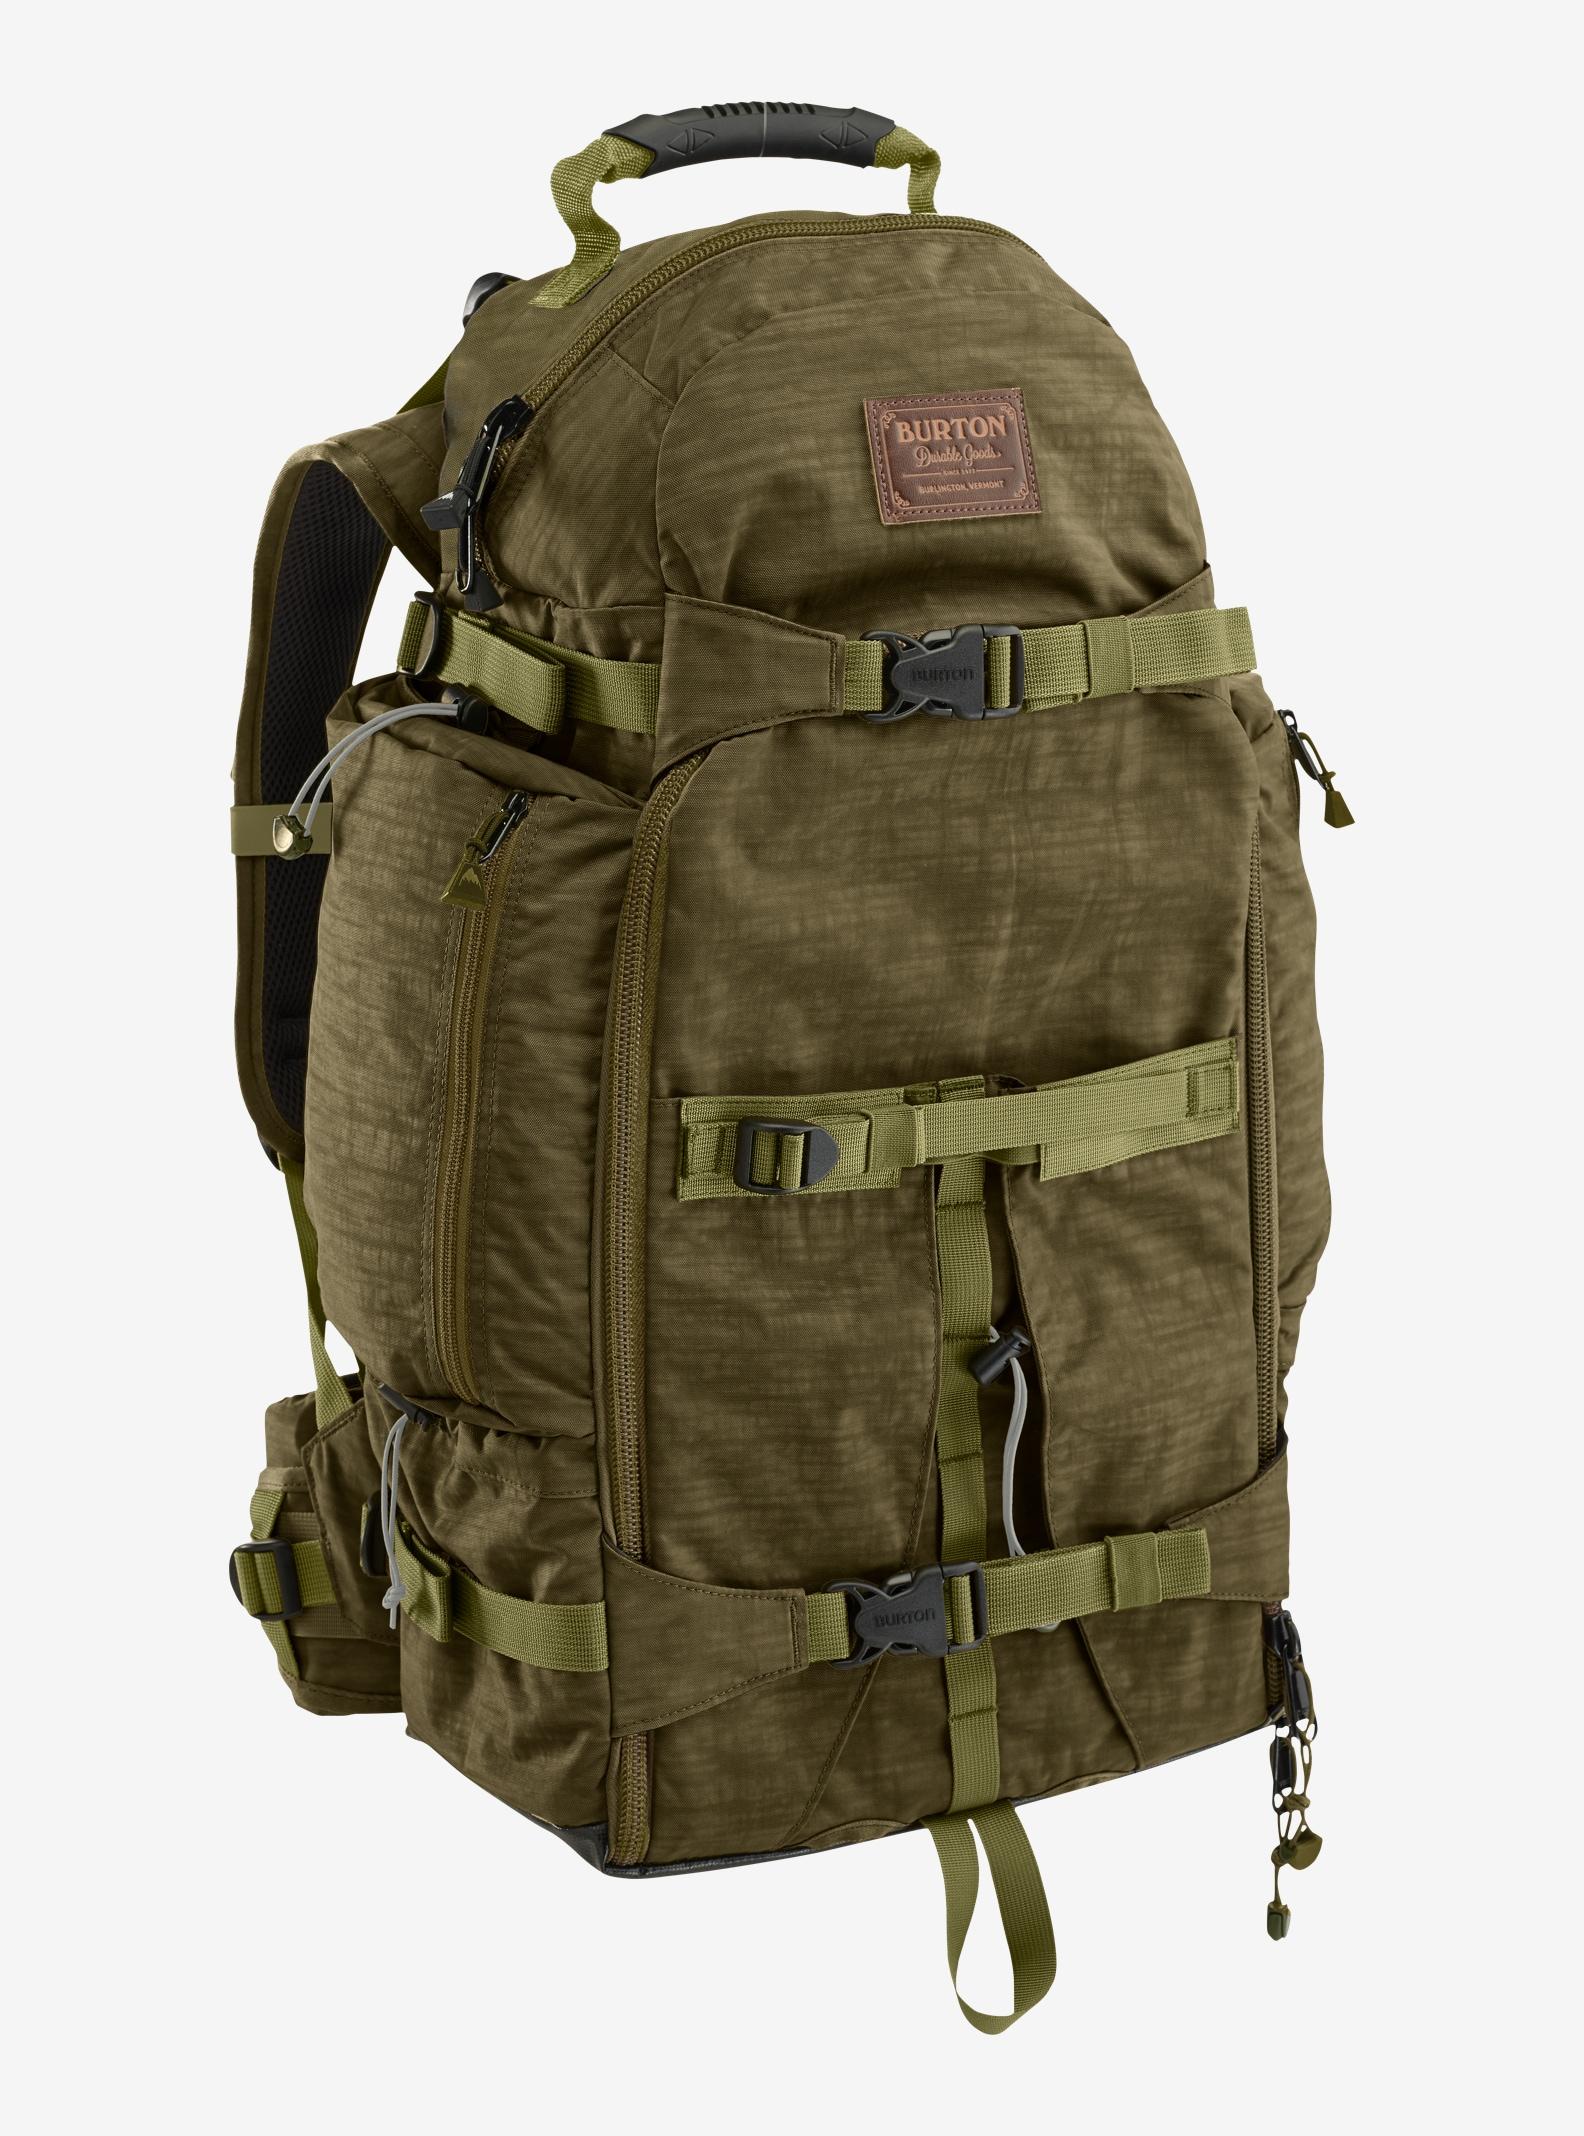 Burton F-Stop 28L Backpack shown in Drab Crinkle